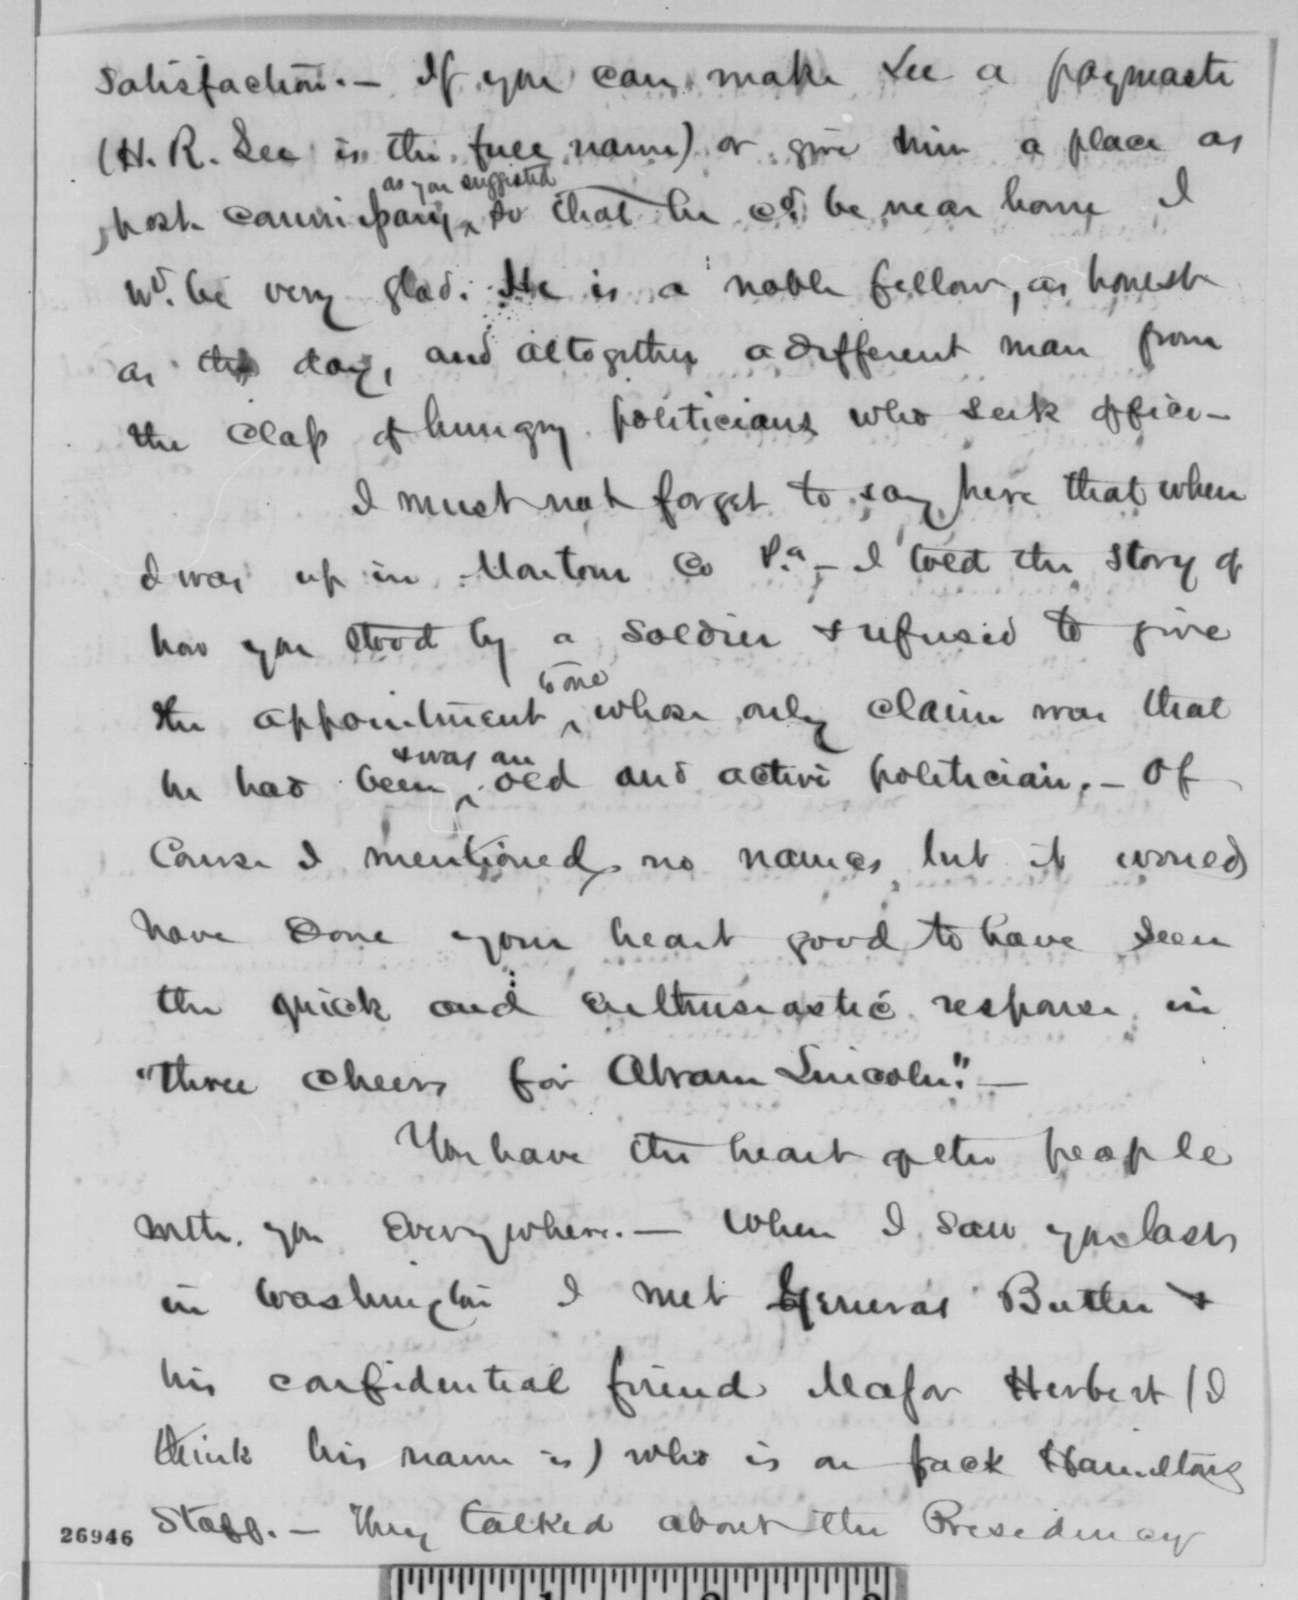 James M. Scovel to Abraham Lincoln, Saturday, October 03, 1863  (Politics)